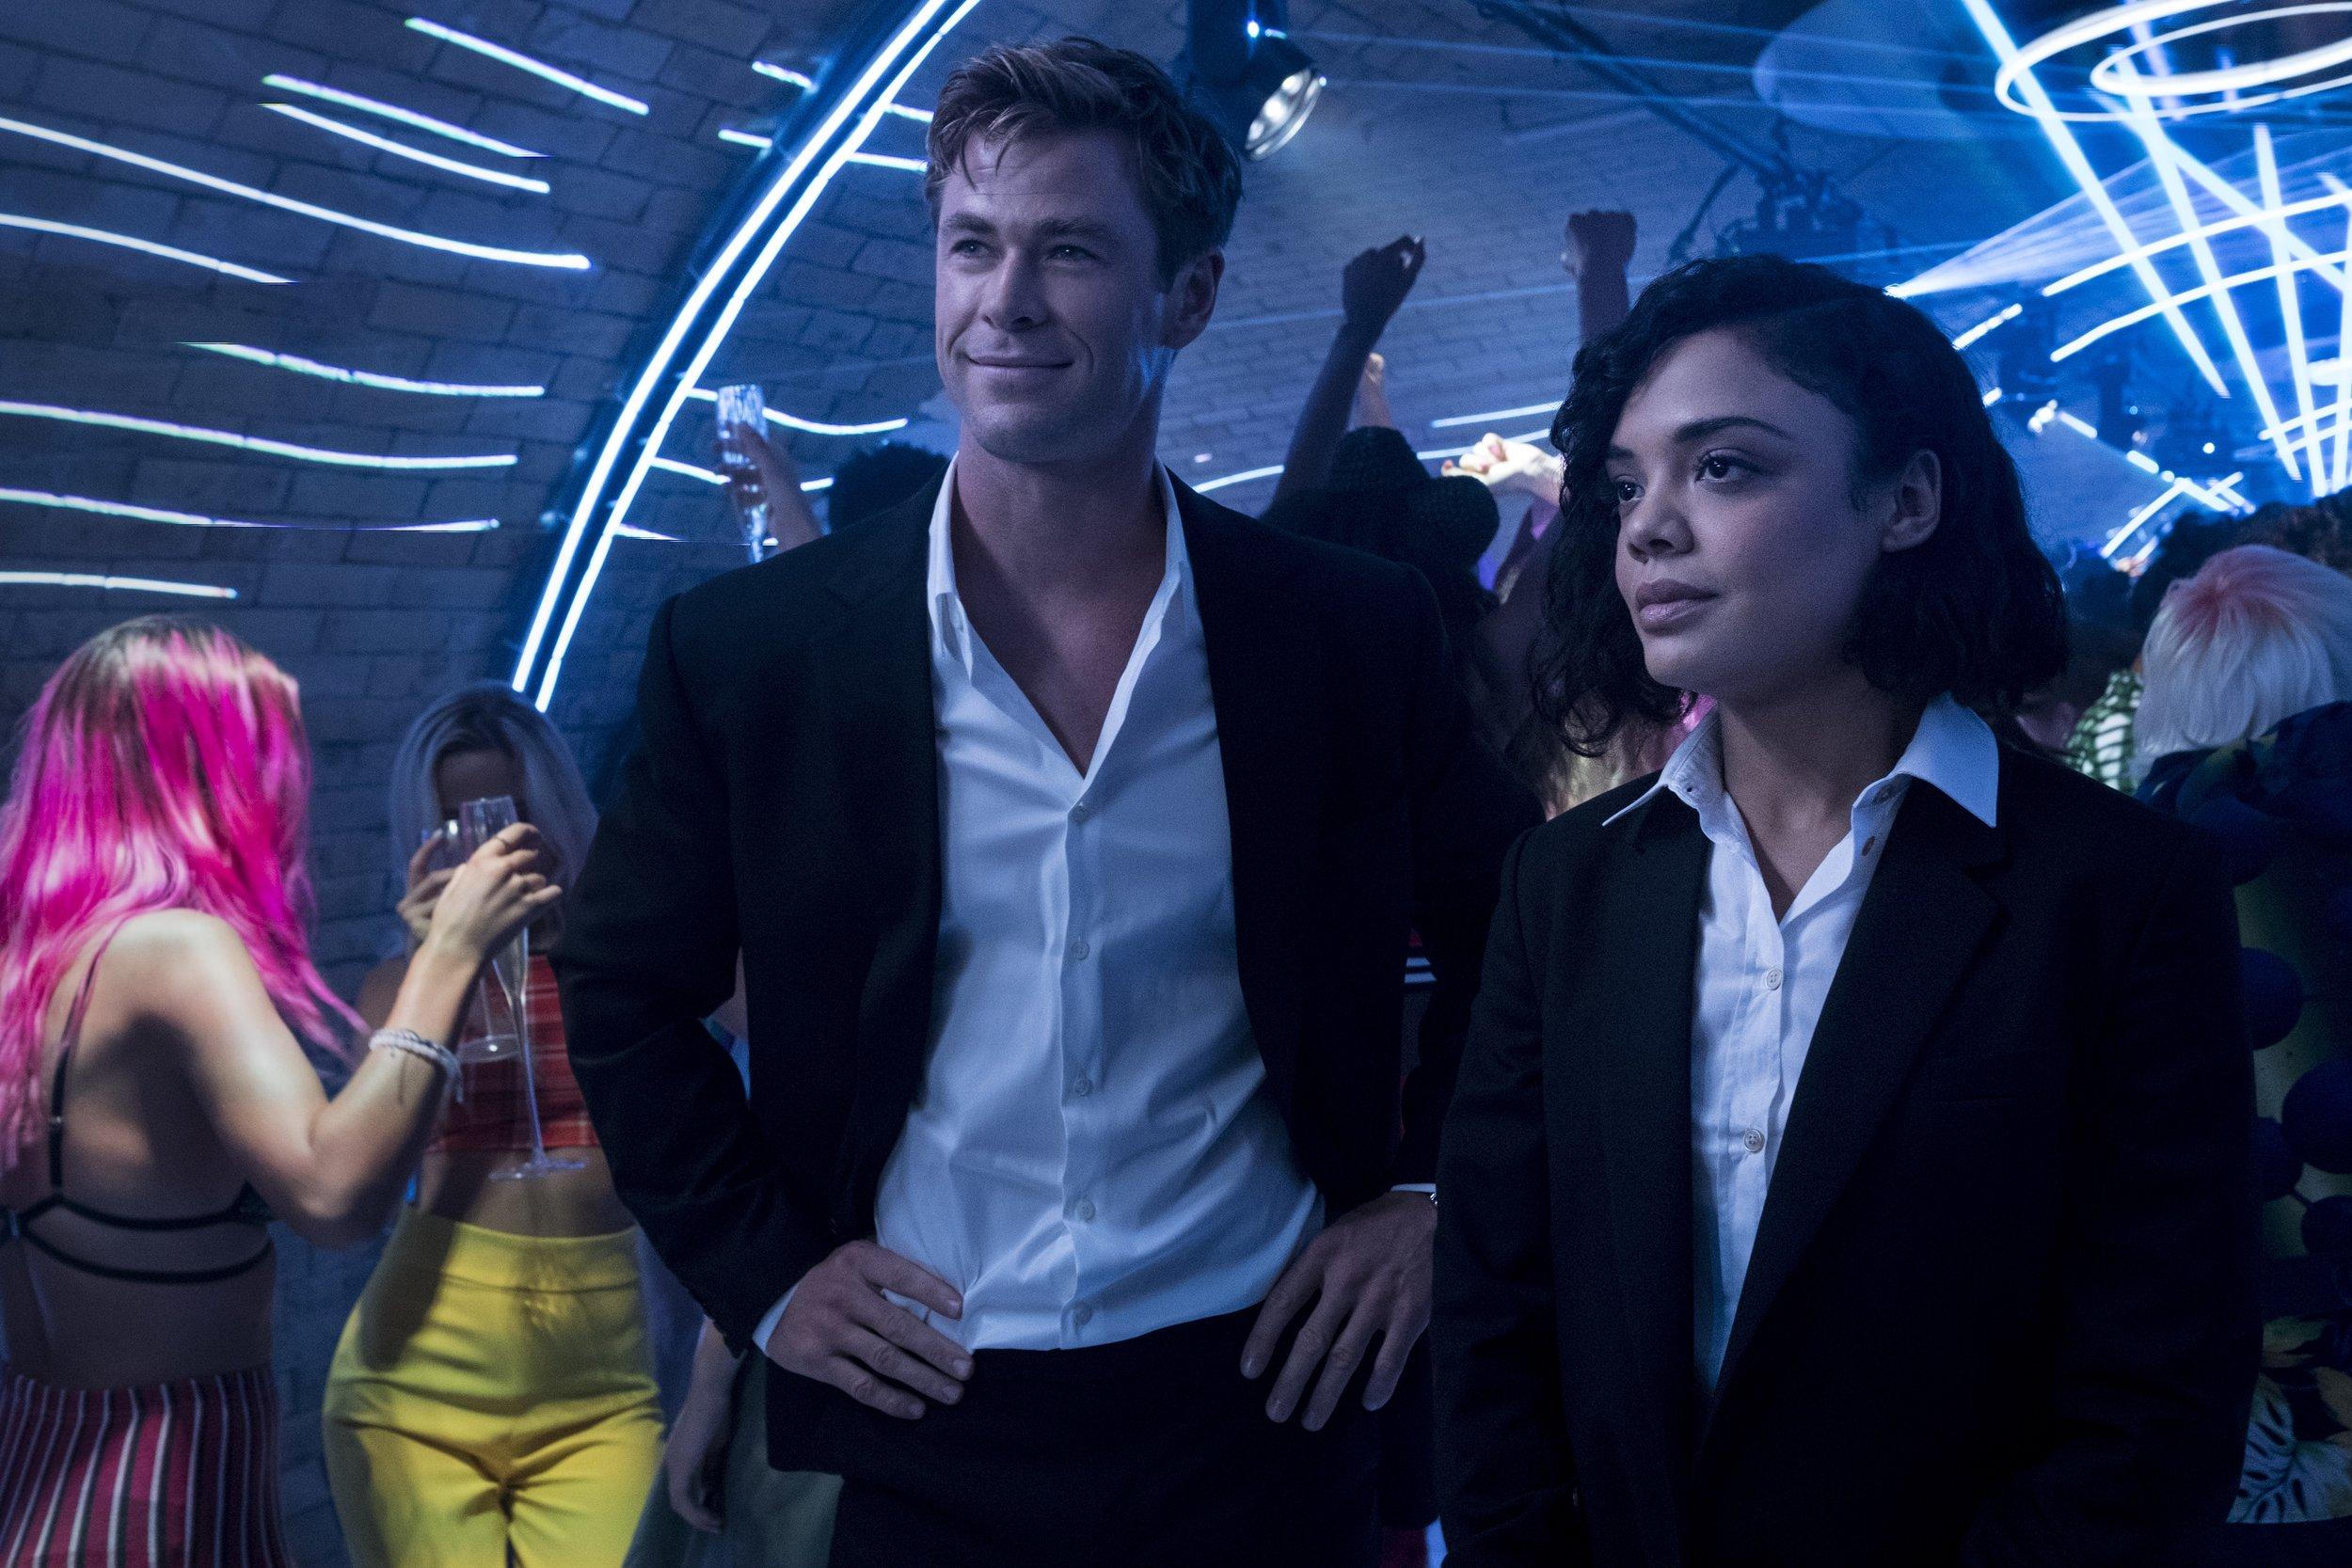 Chris Hemsworth and Tessa Thompson hunt aliens in a London nightclub in Men in Black: International